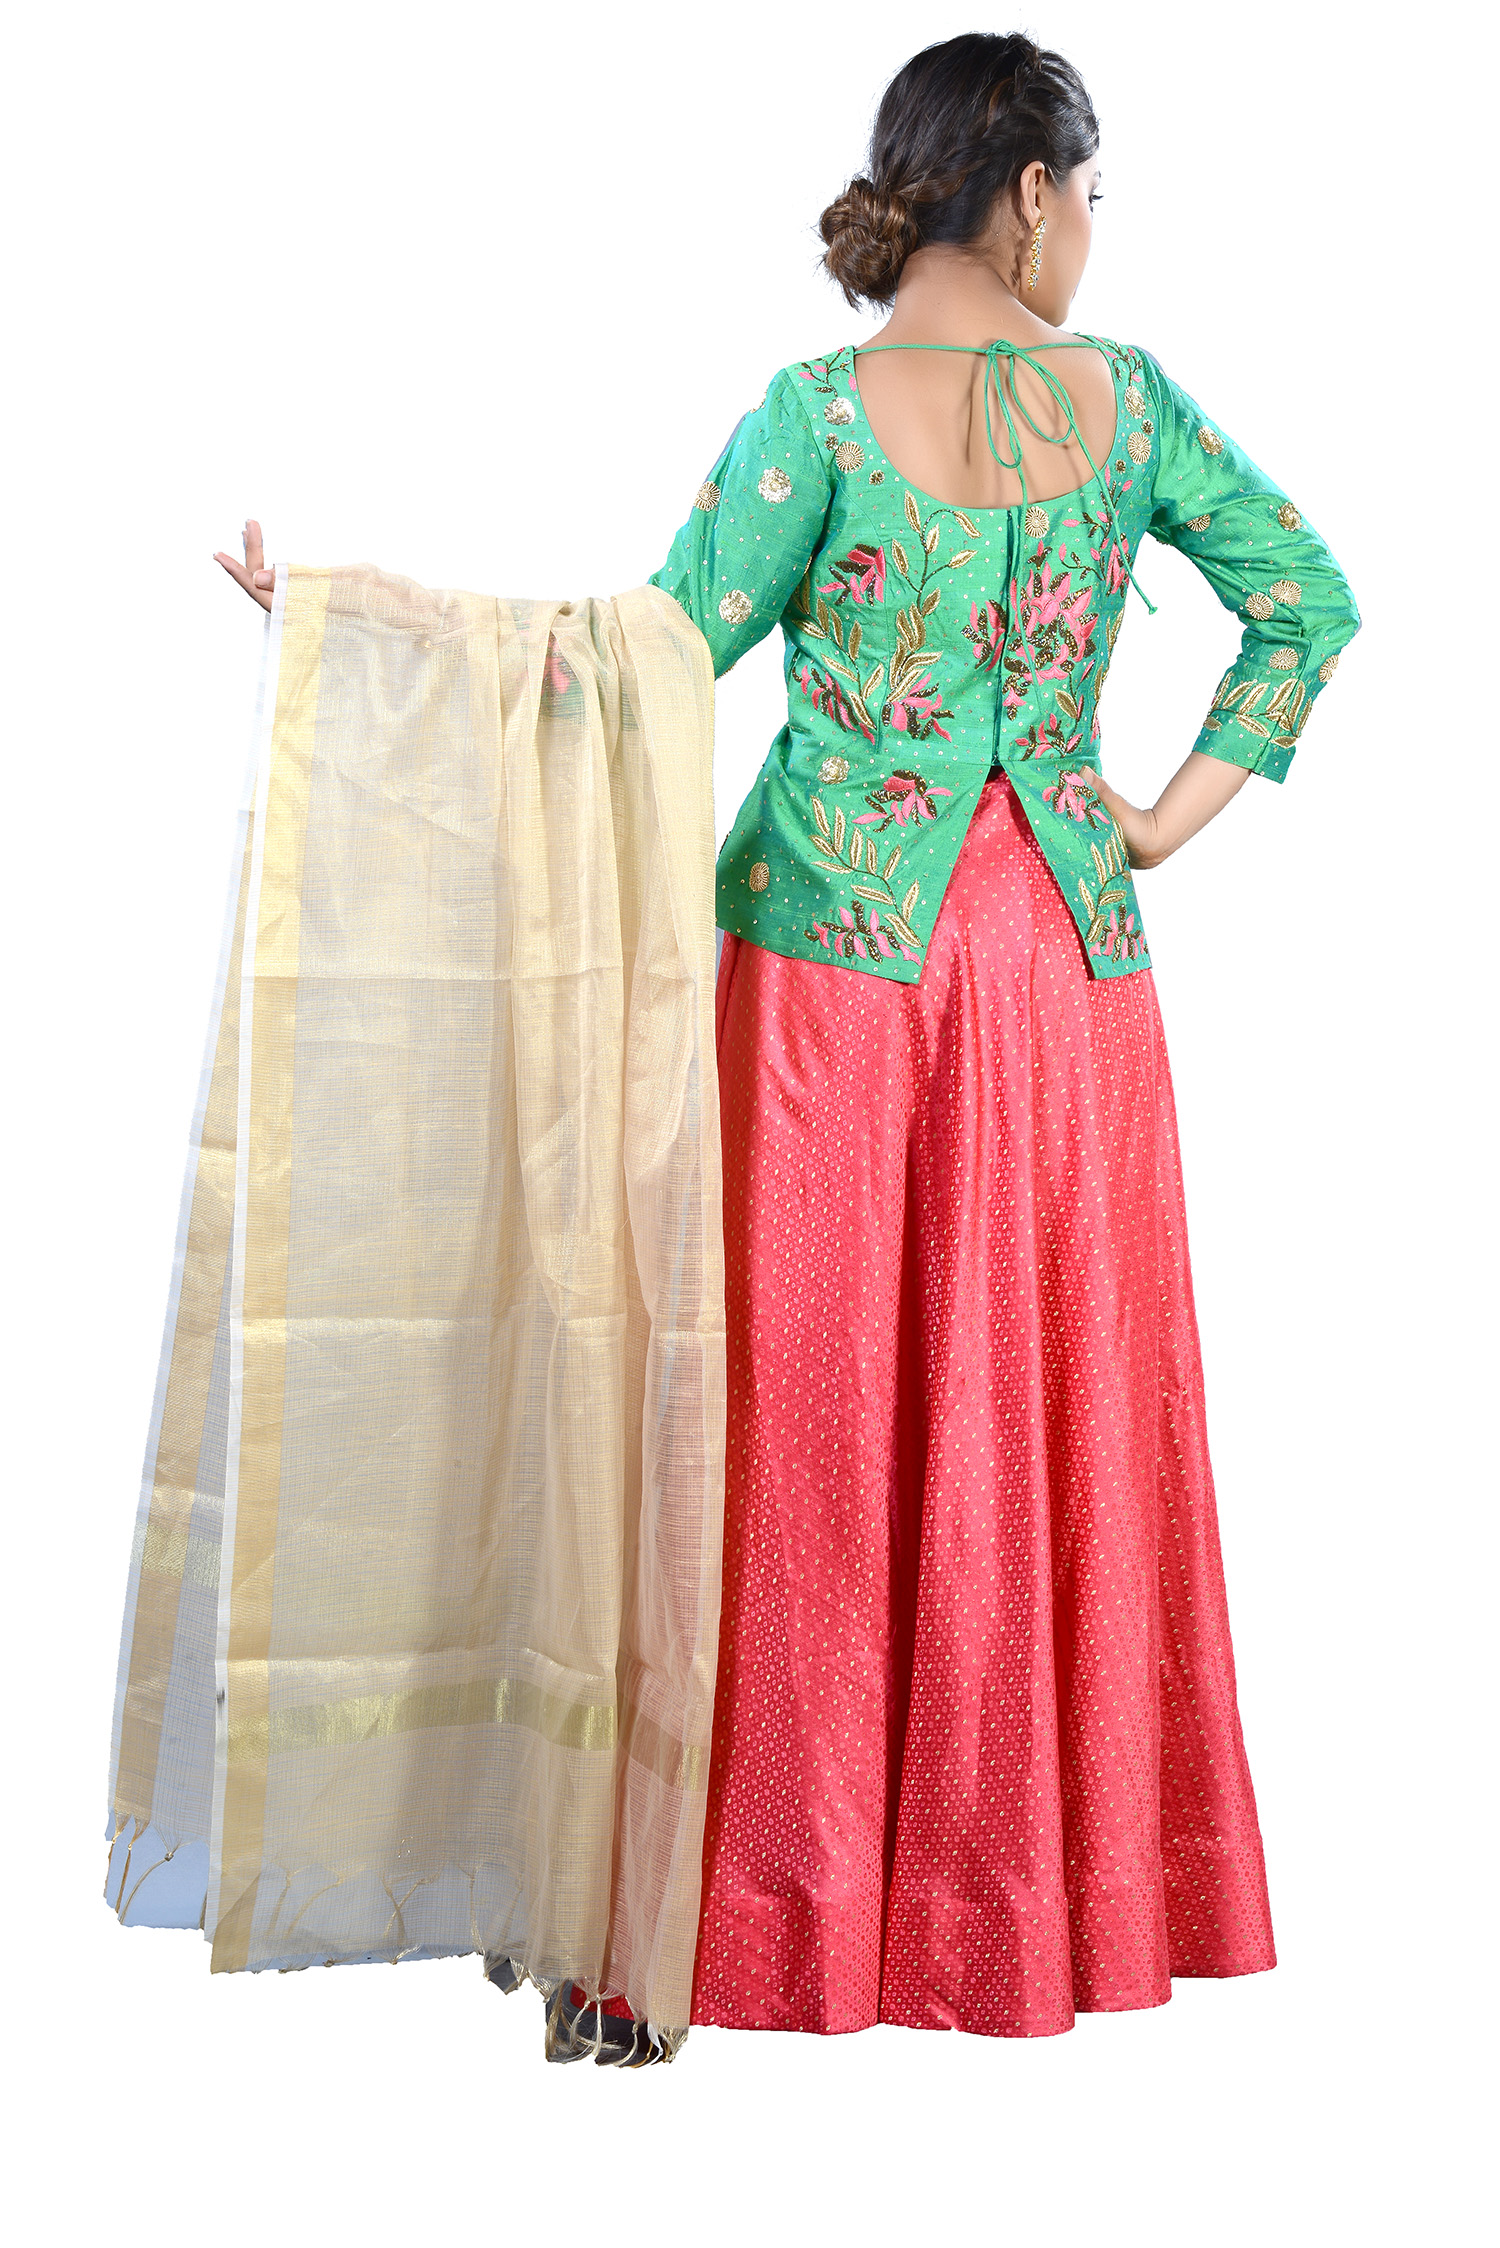 0df75e709a9a1 Green Raw Silk Peplum Top With Zardosi Work And Banarasi` Skirt